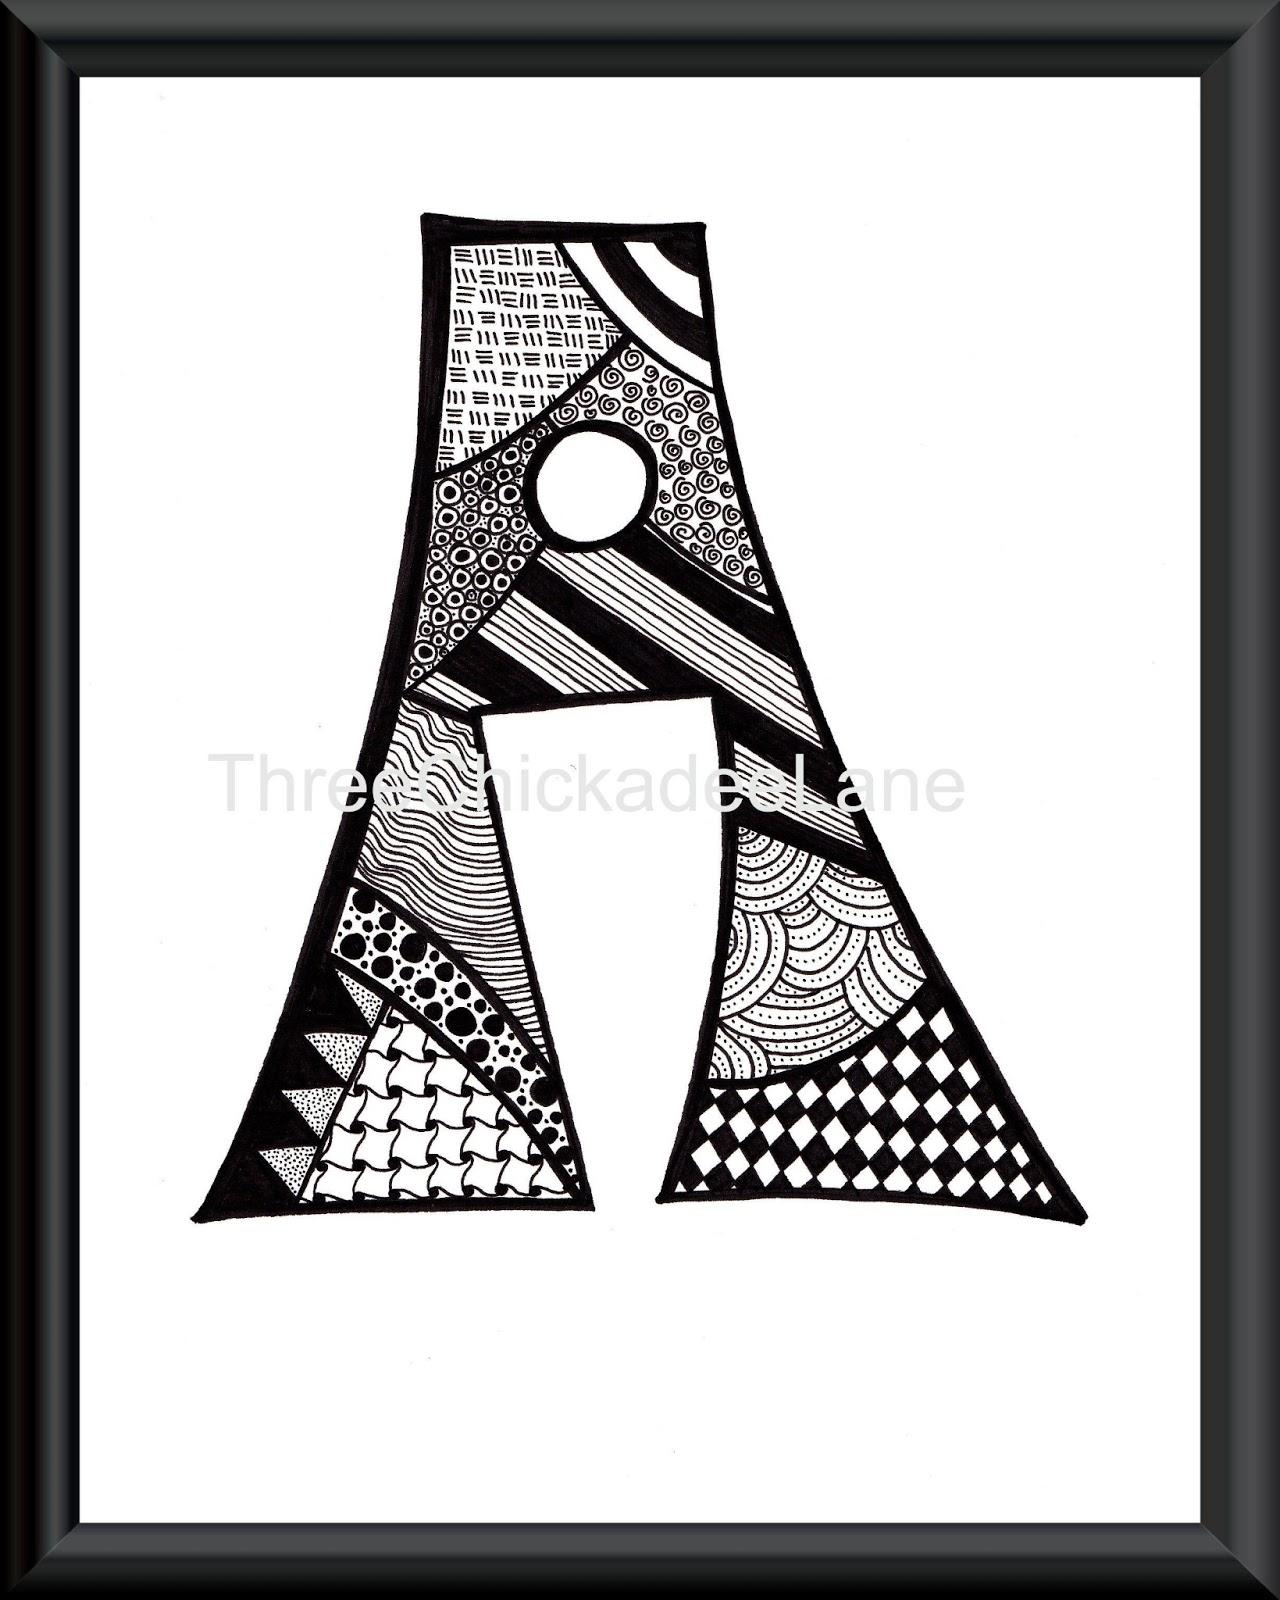 Chickadee Happenings Zentangle Letters